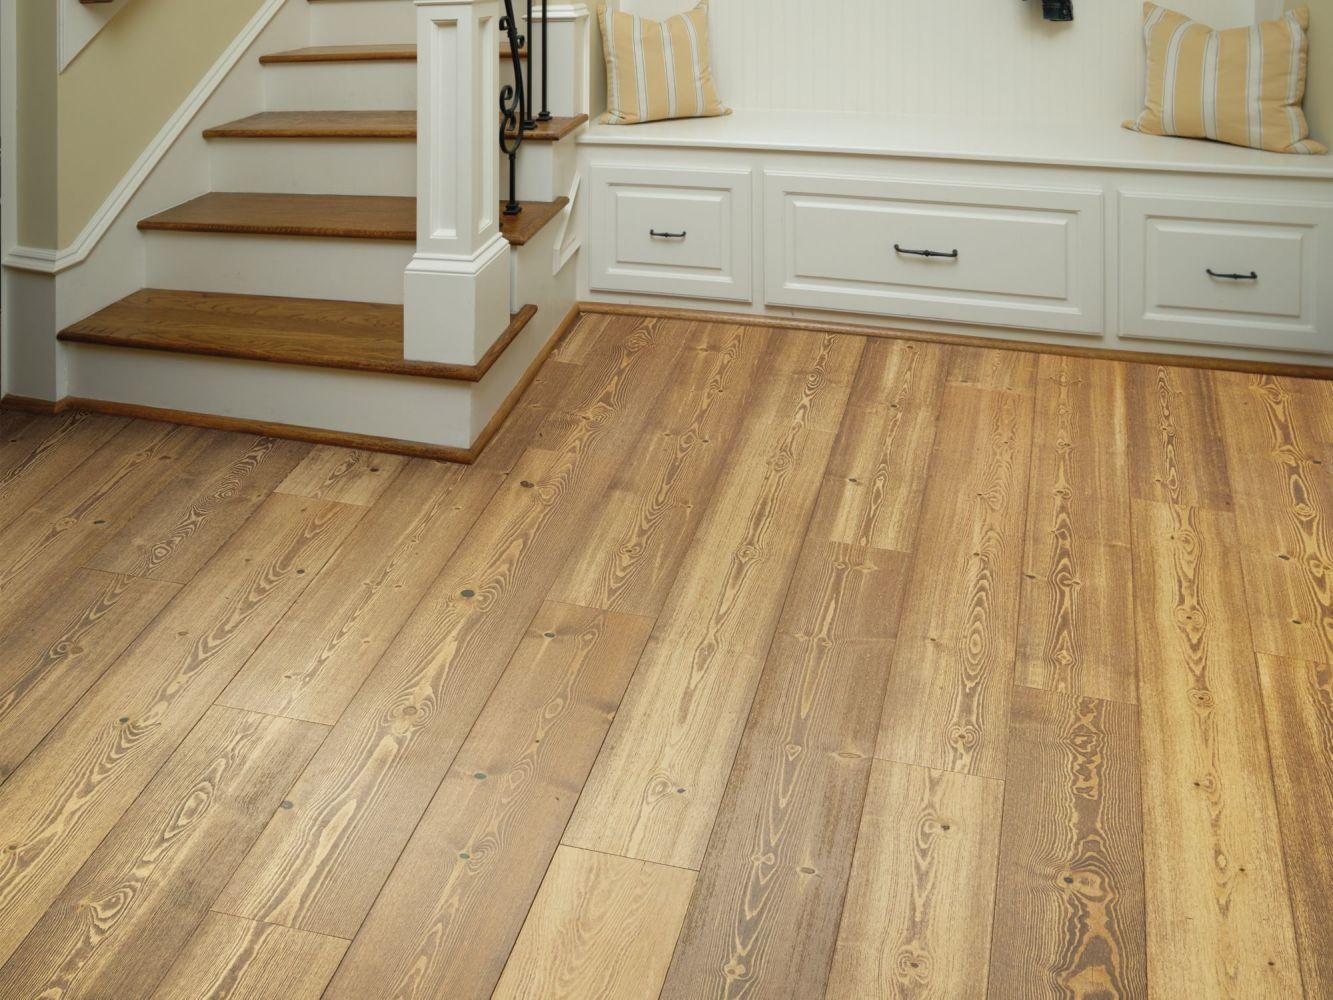 Shaw Floors Floorte Exquisite Spiced Pine 06004_250RH